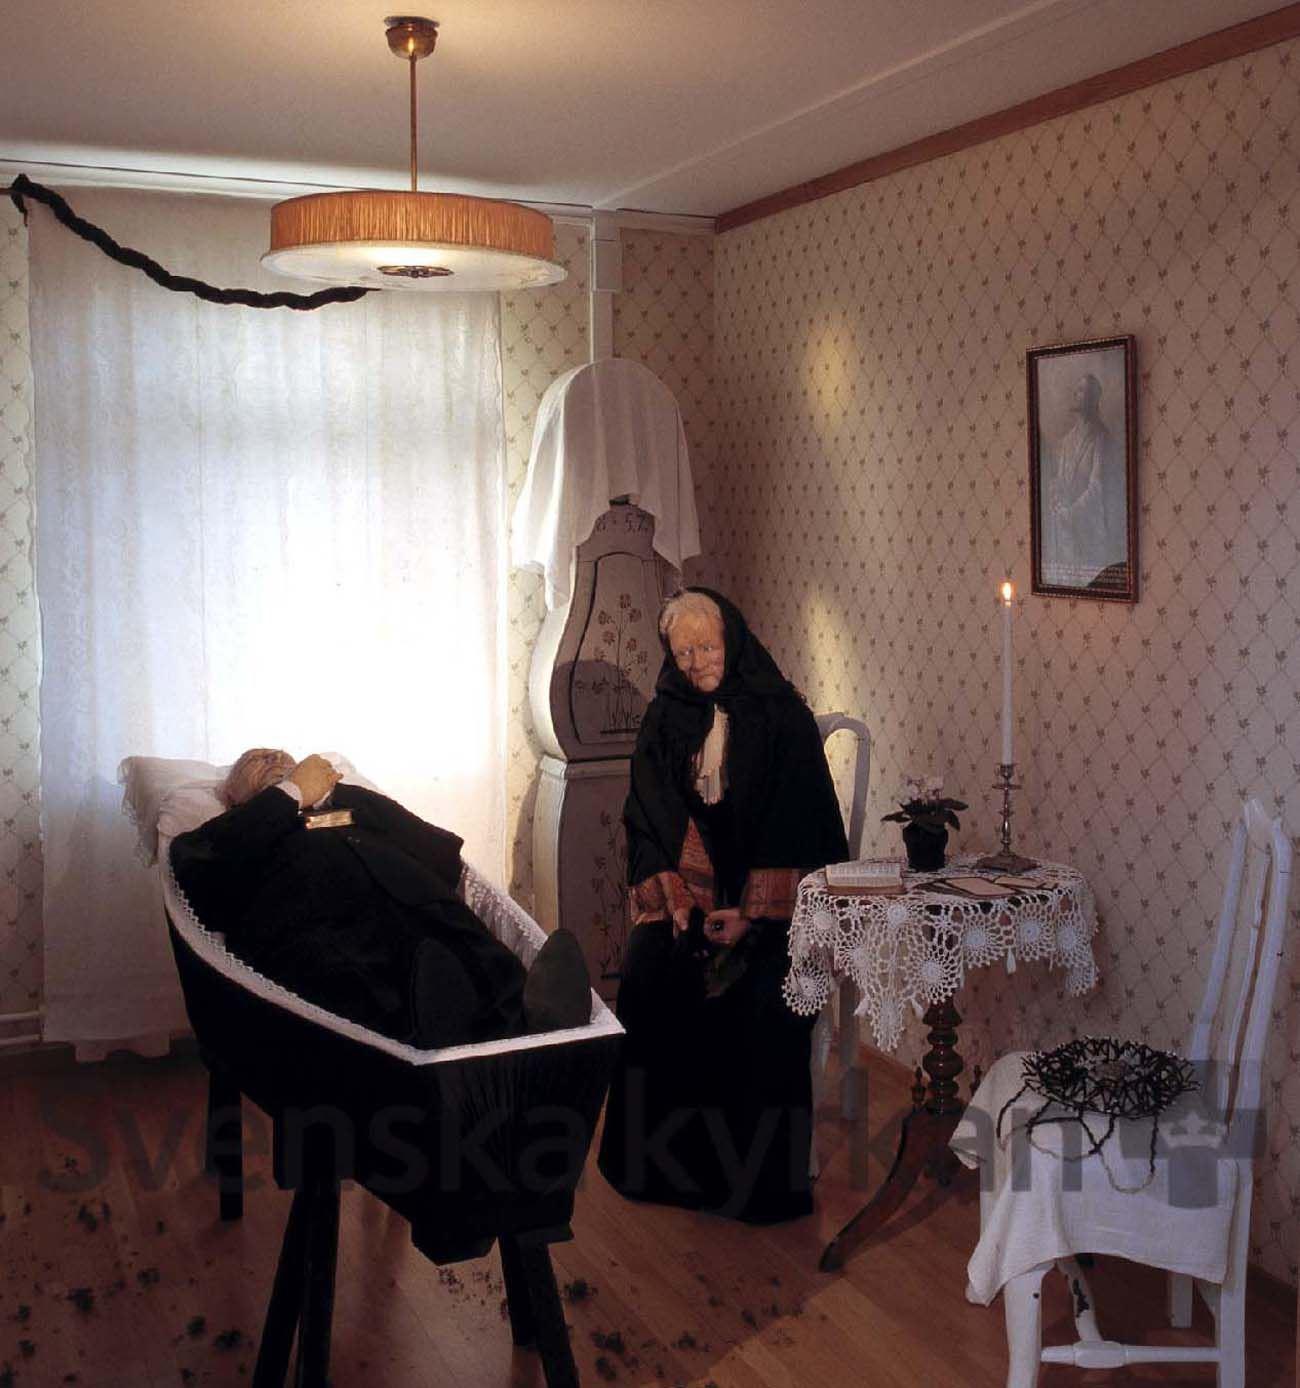 Foto Studio Lennart, Begravningsmuseet